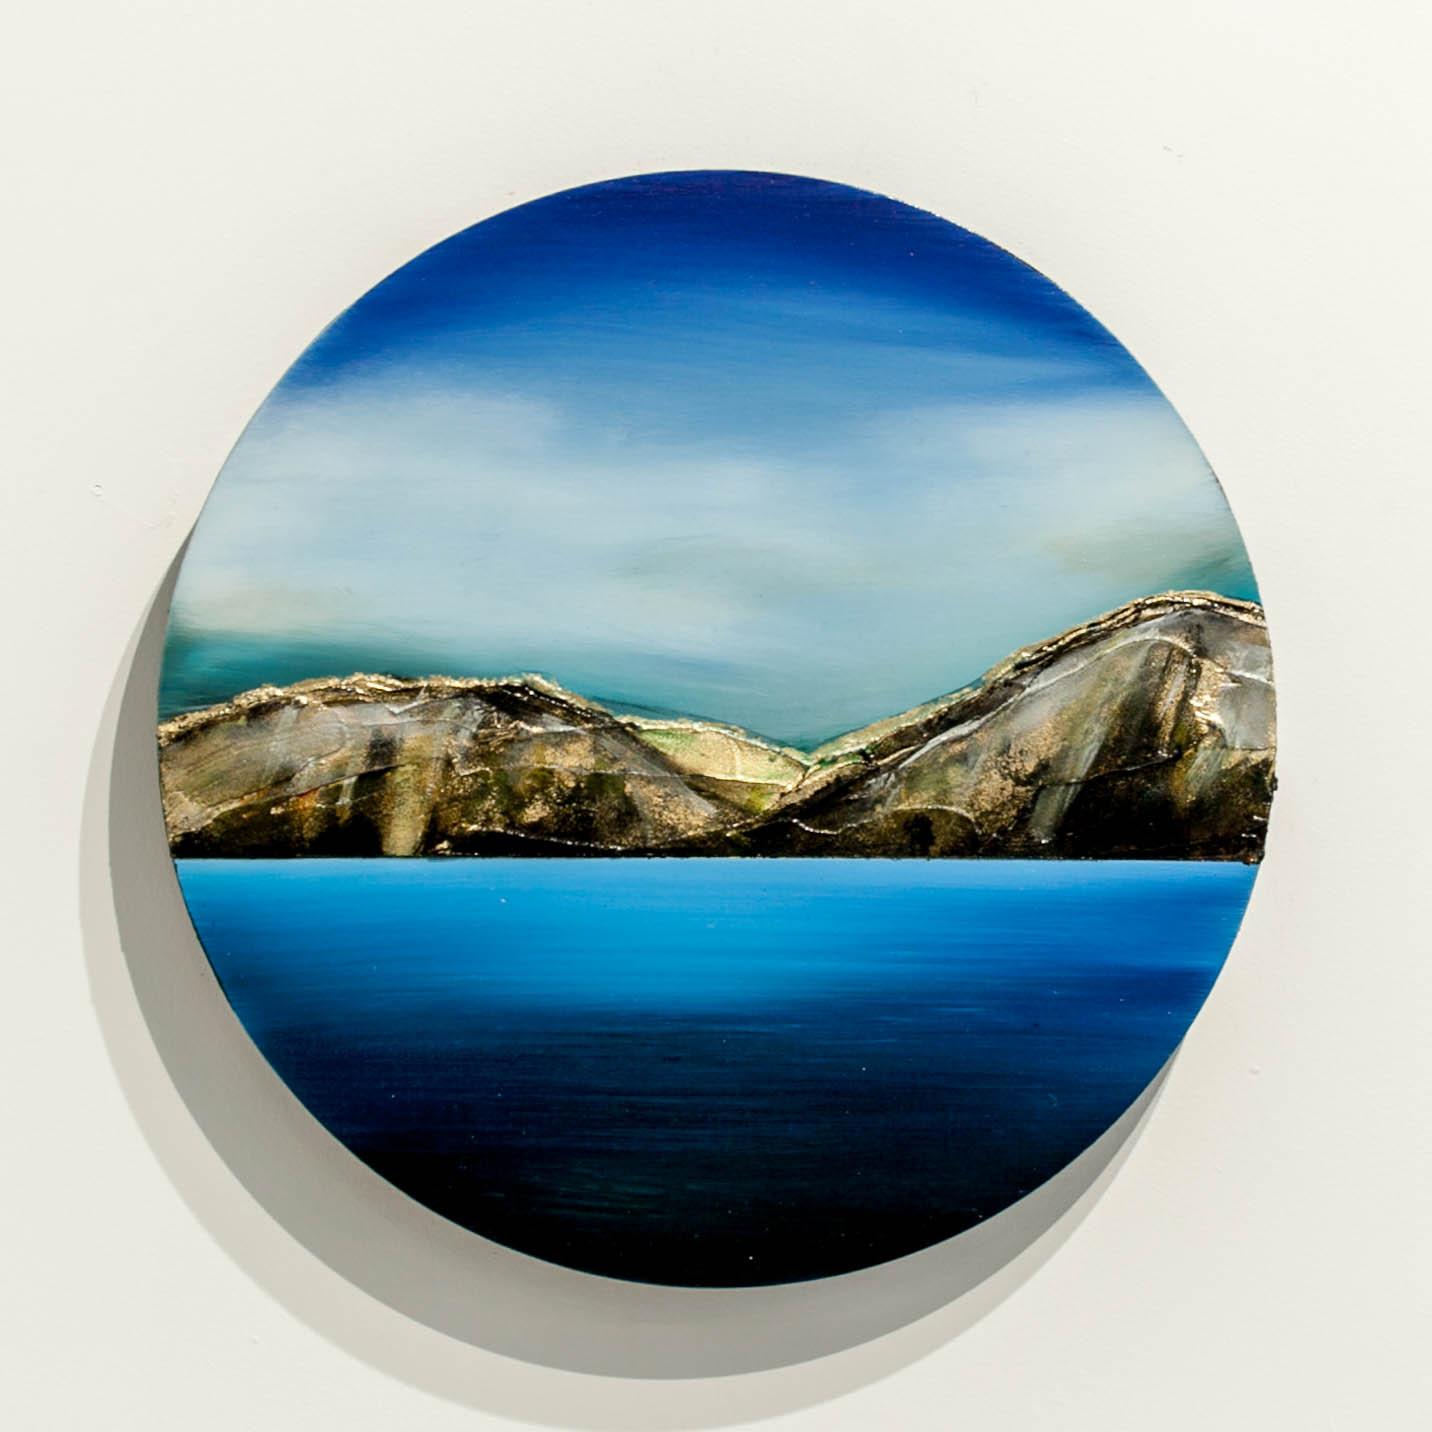 51b. $1200 Triptych, Juliet Best, Rongokako Big Love